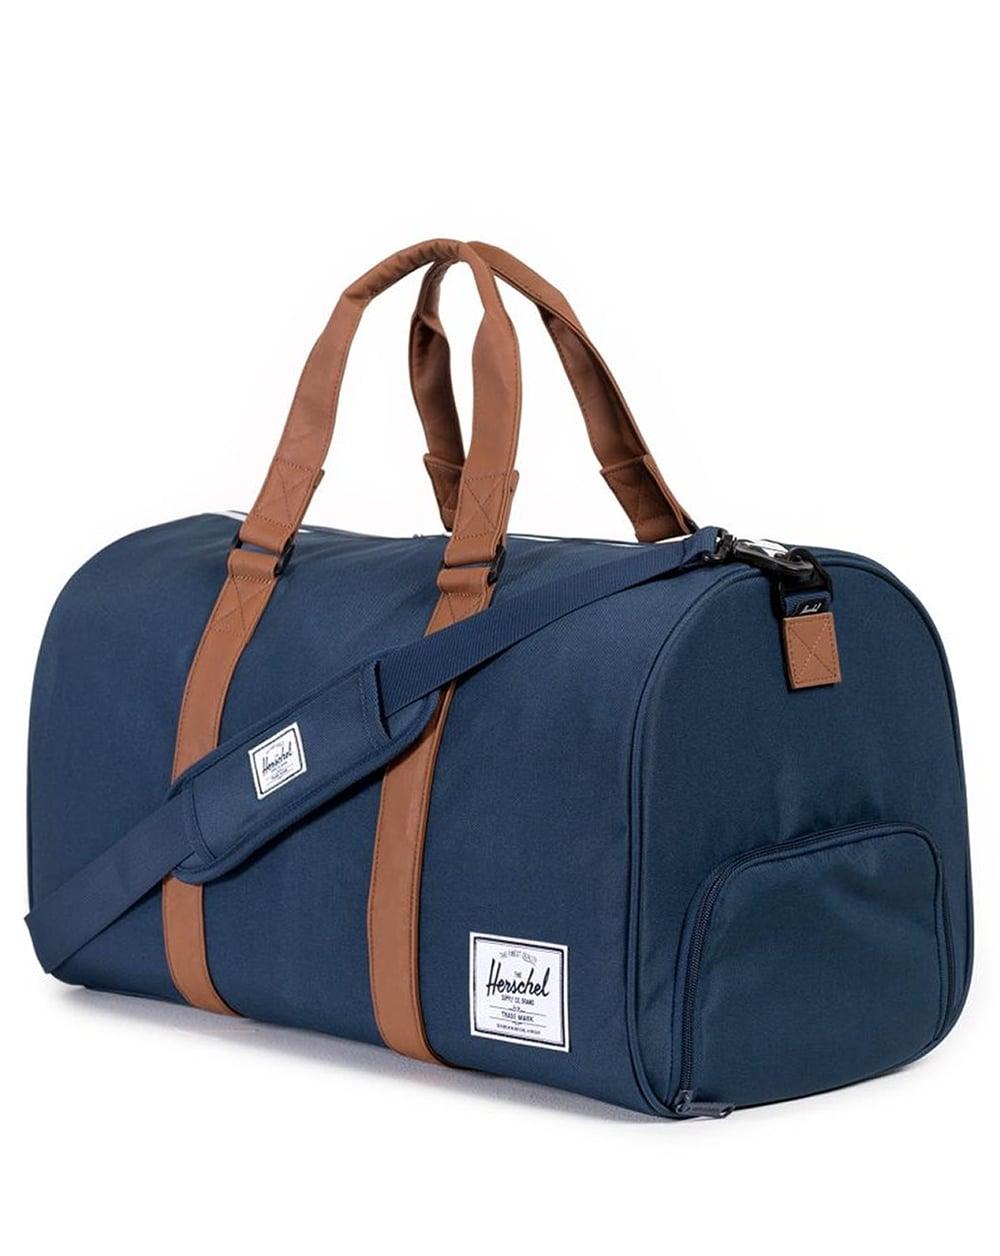 526a0f0abeb Herschel Novel Duffle Bag Navy Tan,holdall,rucksack,shoulder